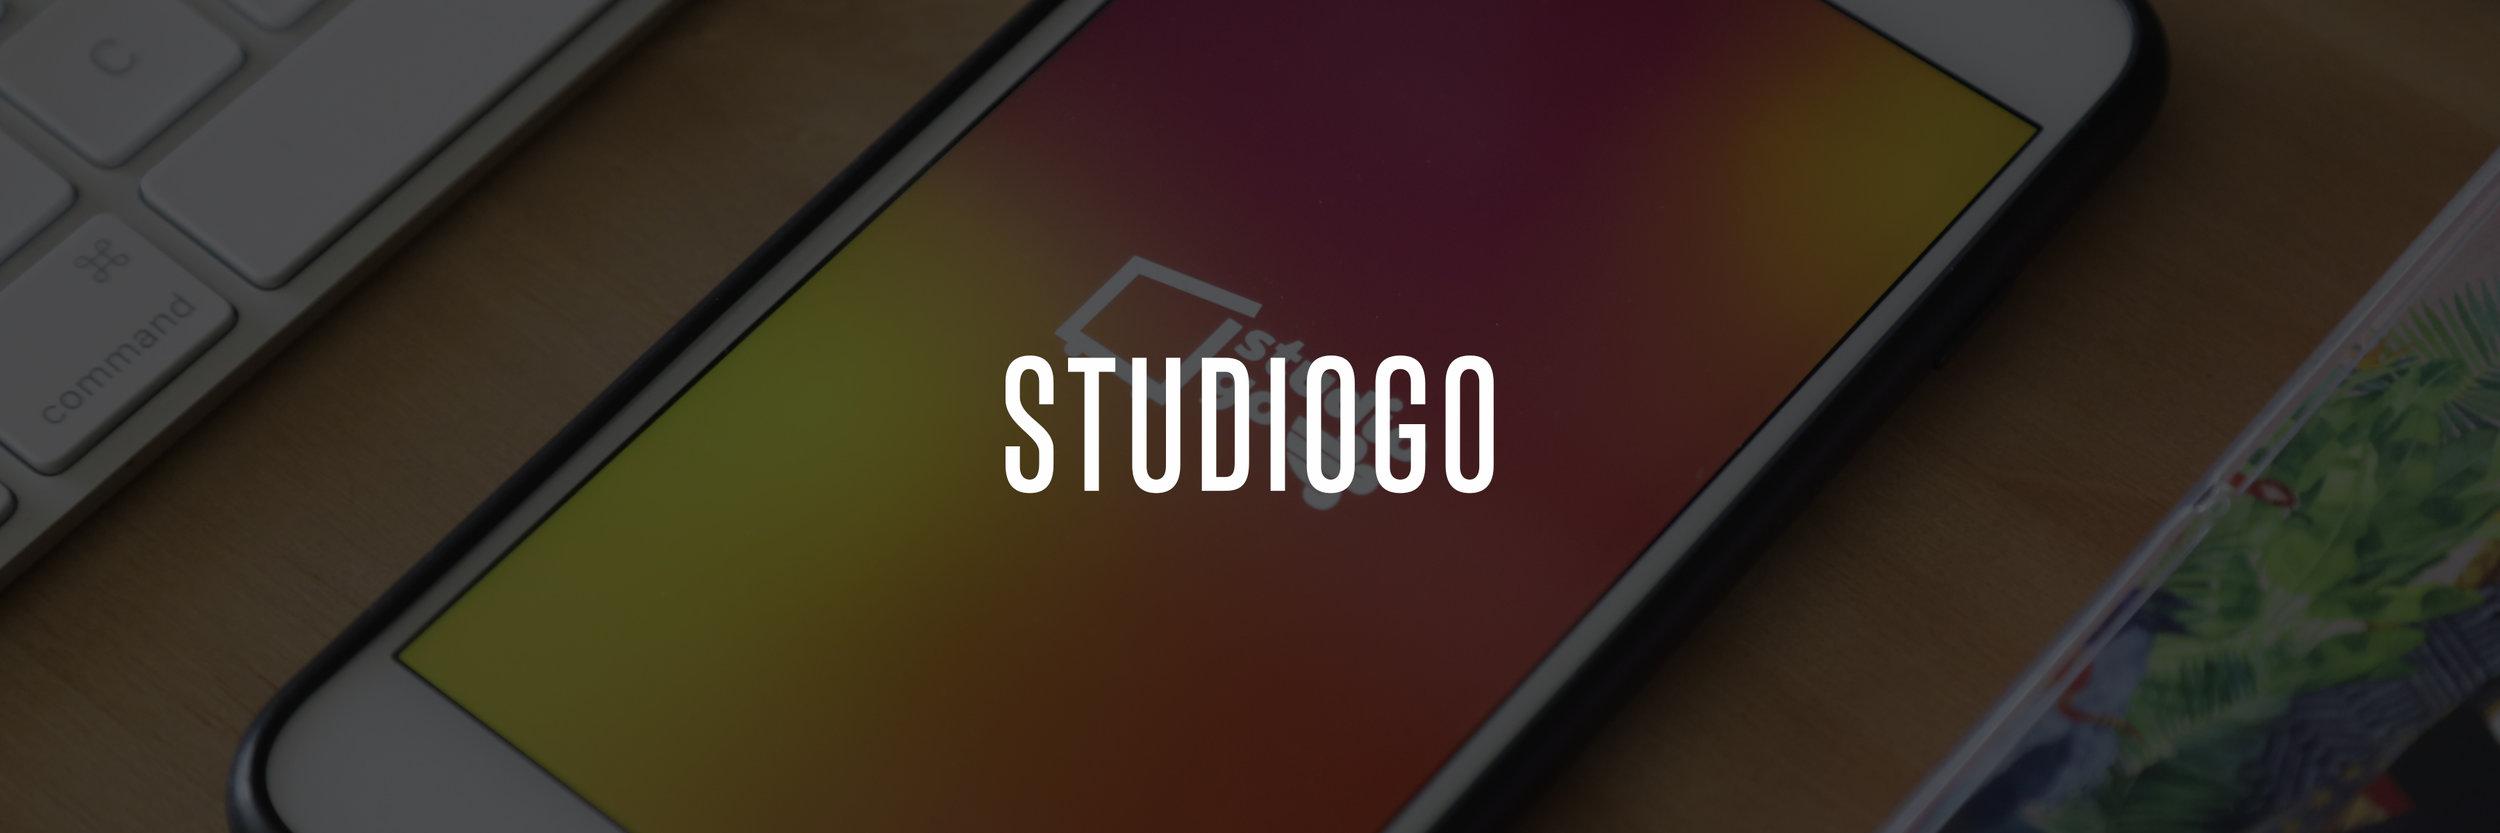 StudioGoHeader.jpg